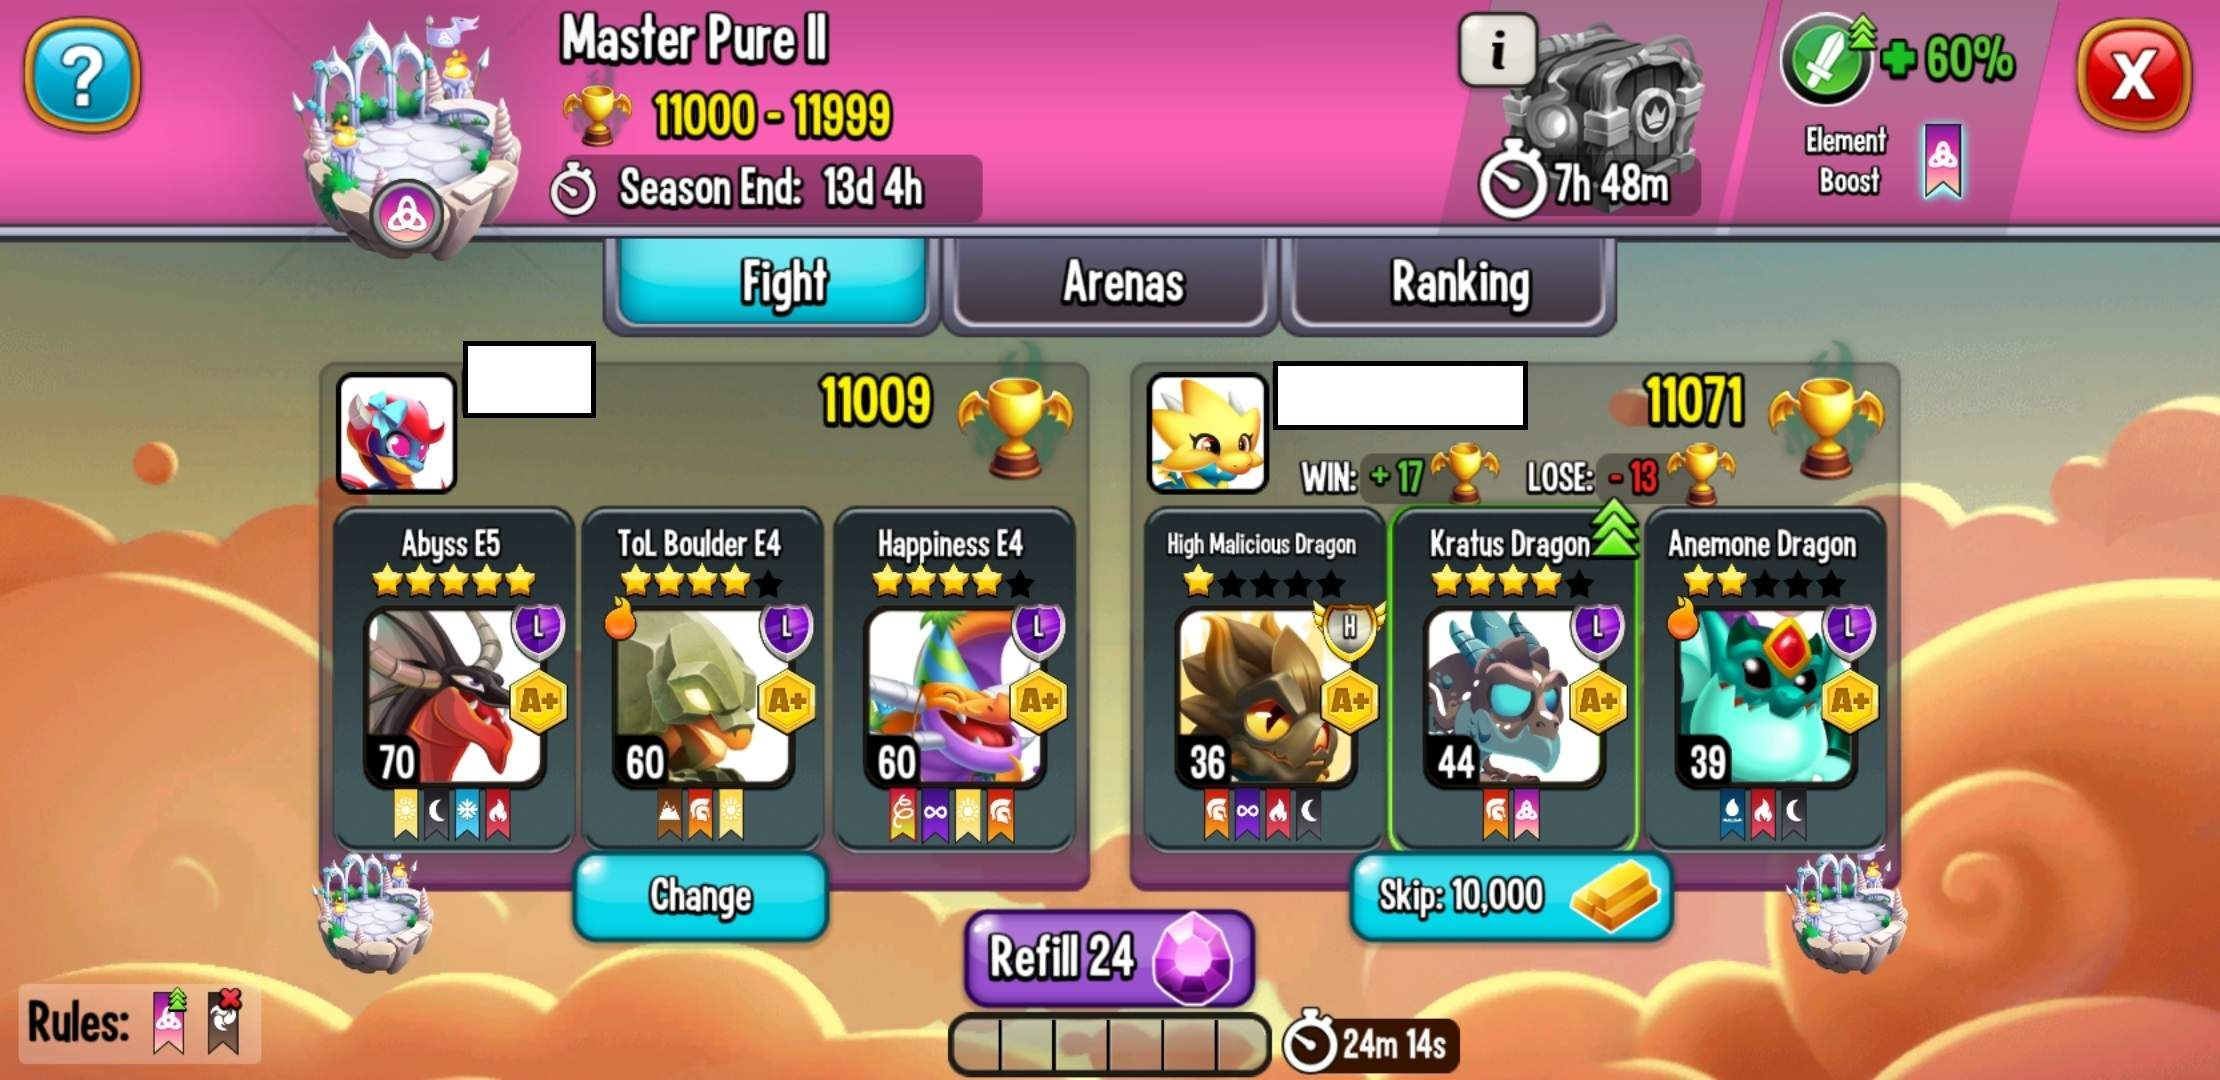 0_1573631854097_111319 master pure 2 arena 2.jpg